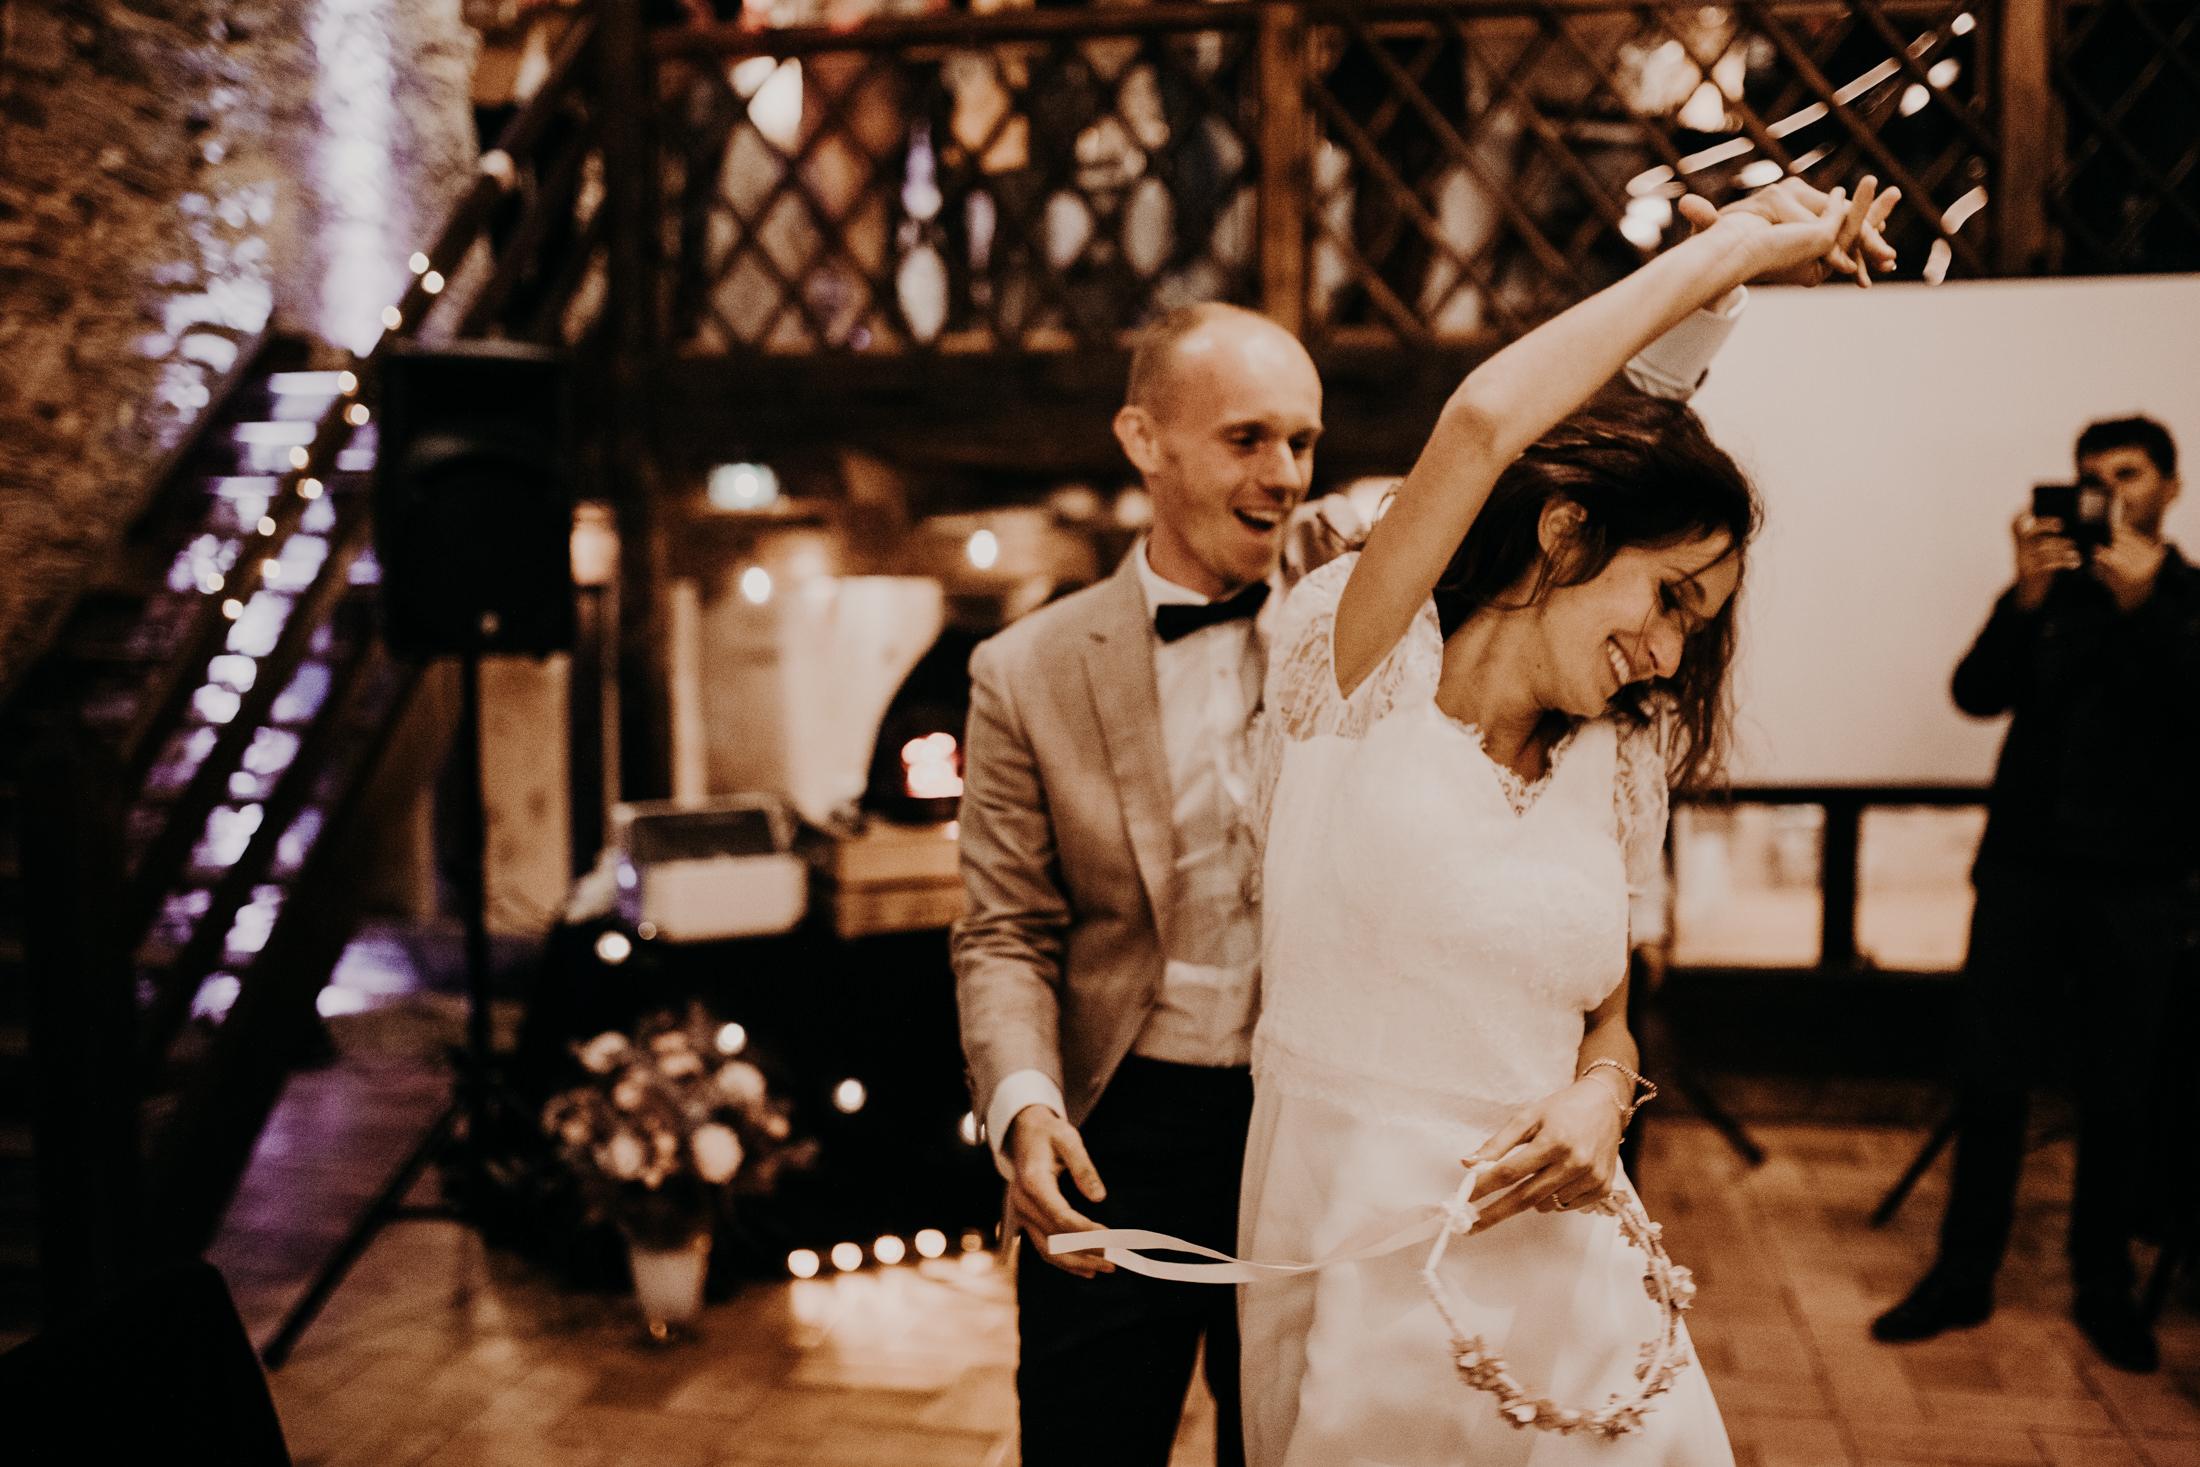 Mariage auvergne photographe wedding_-101.jpg